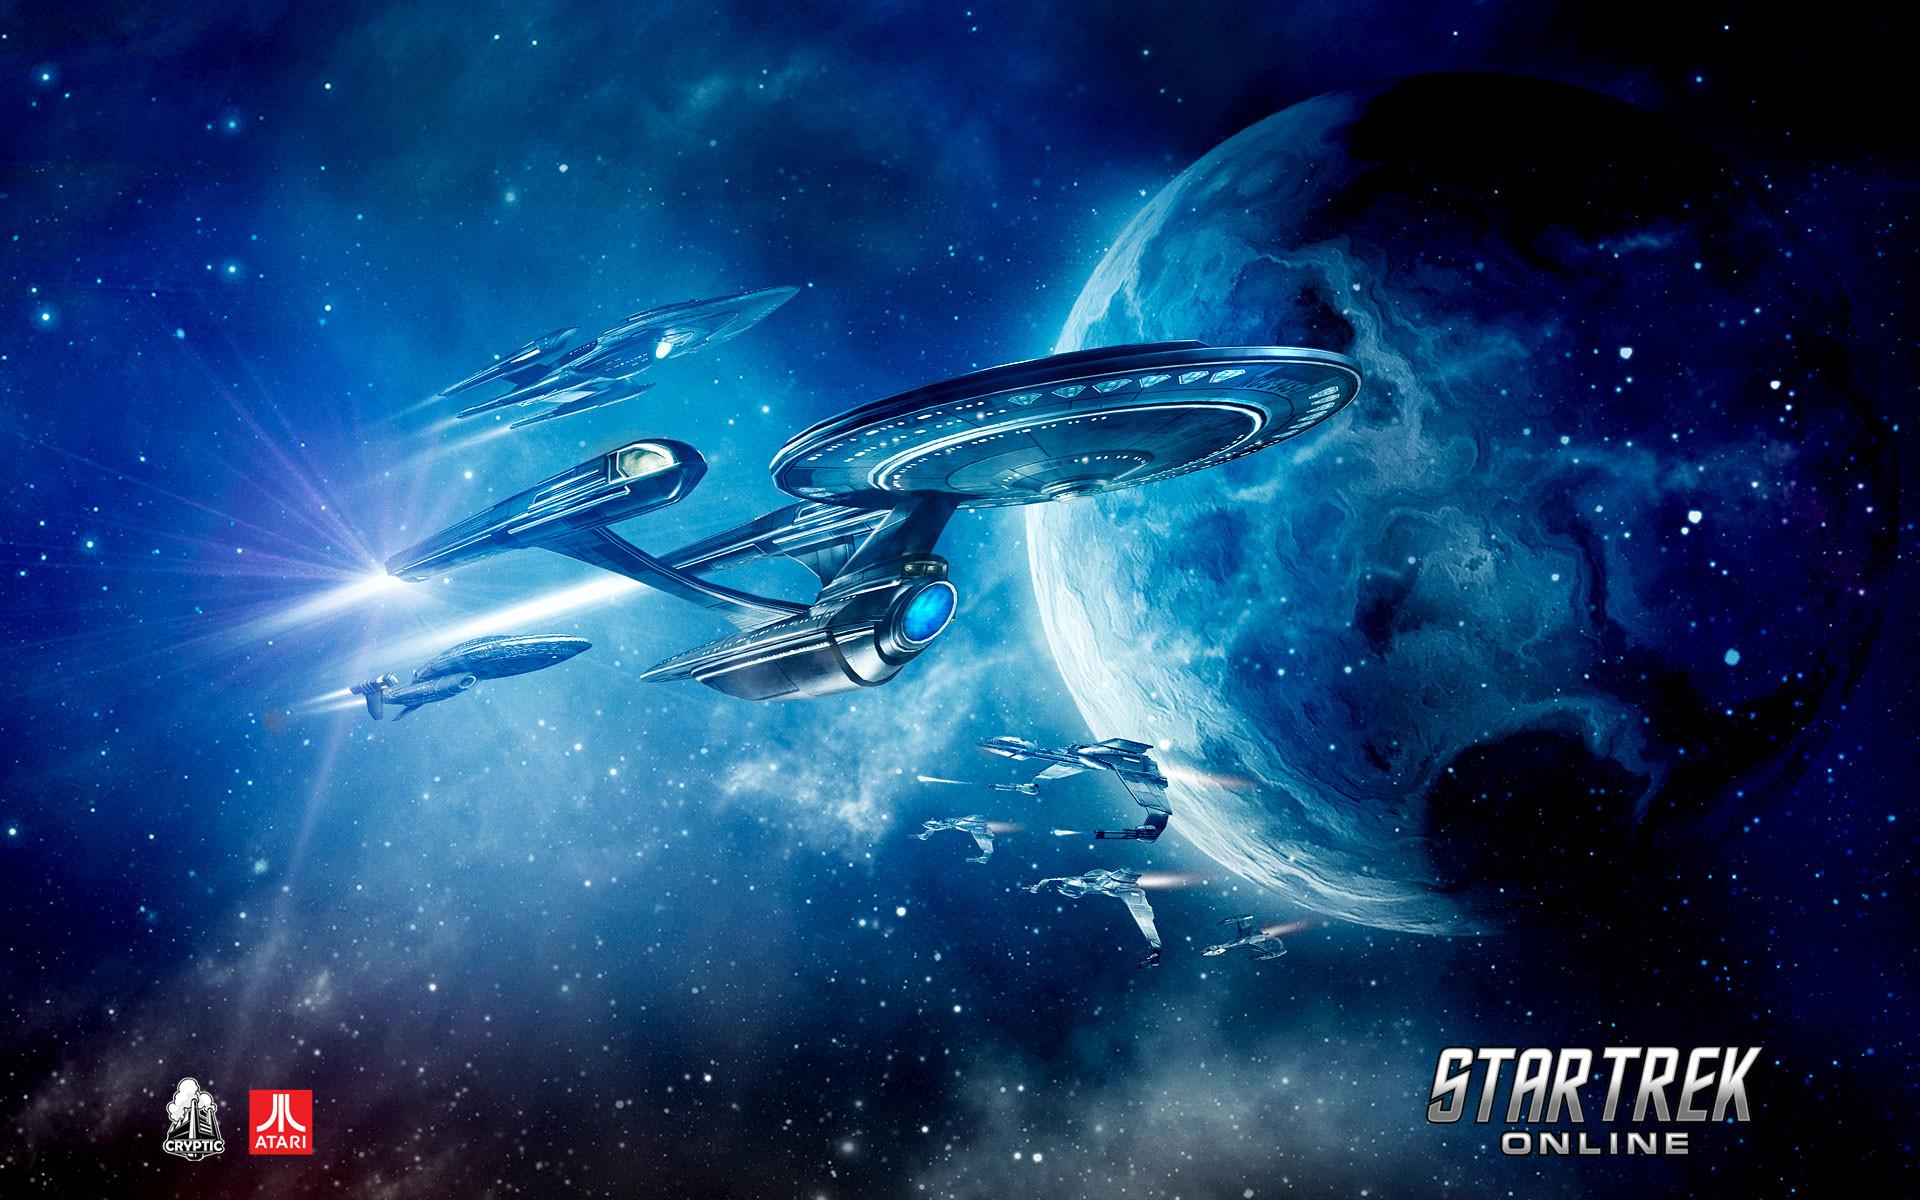 Star Trek Wallpaper HD 1080p | ImageBank.biz